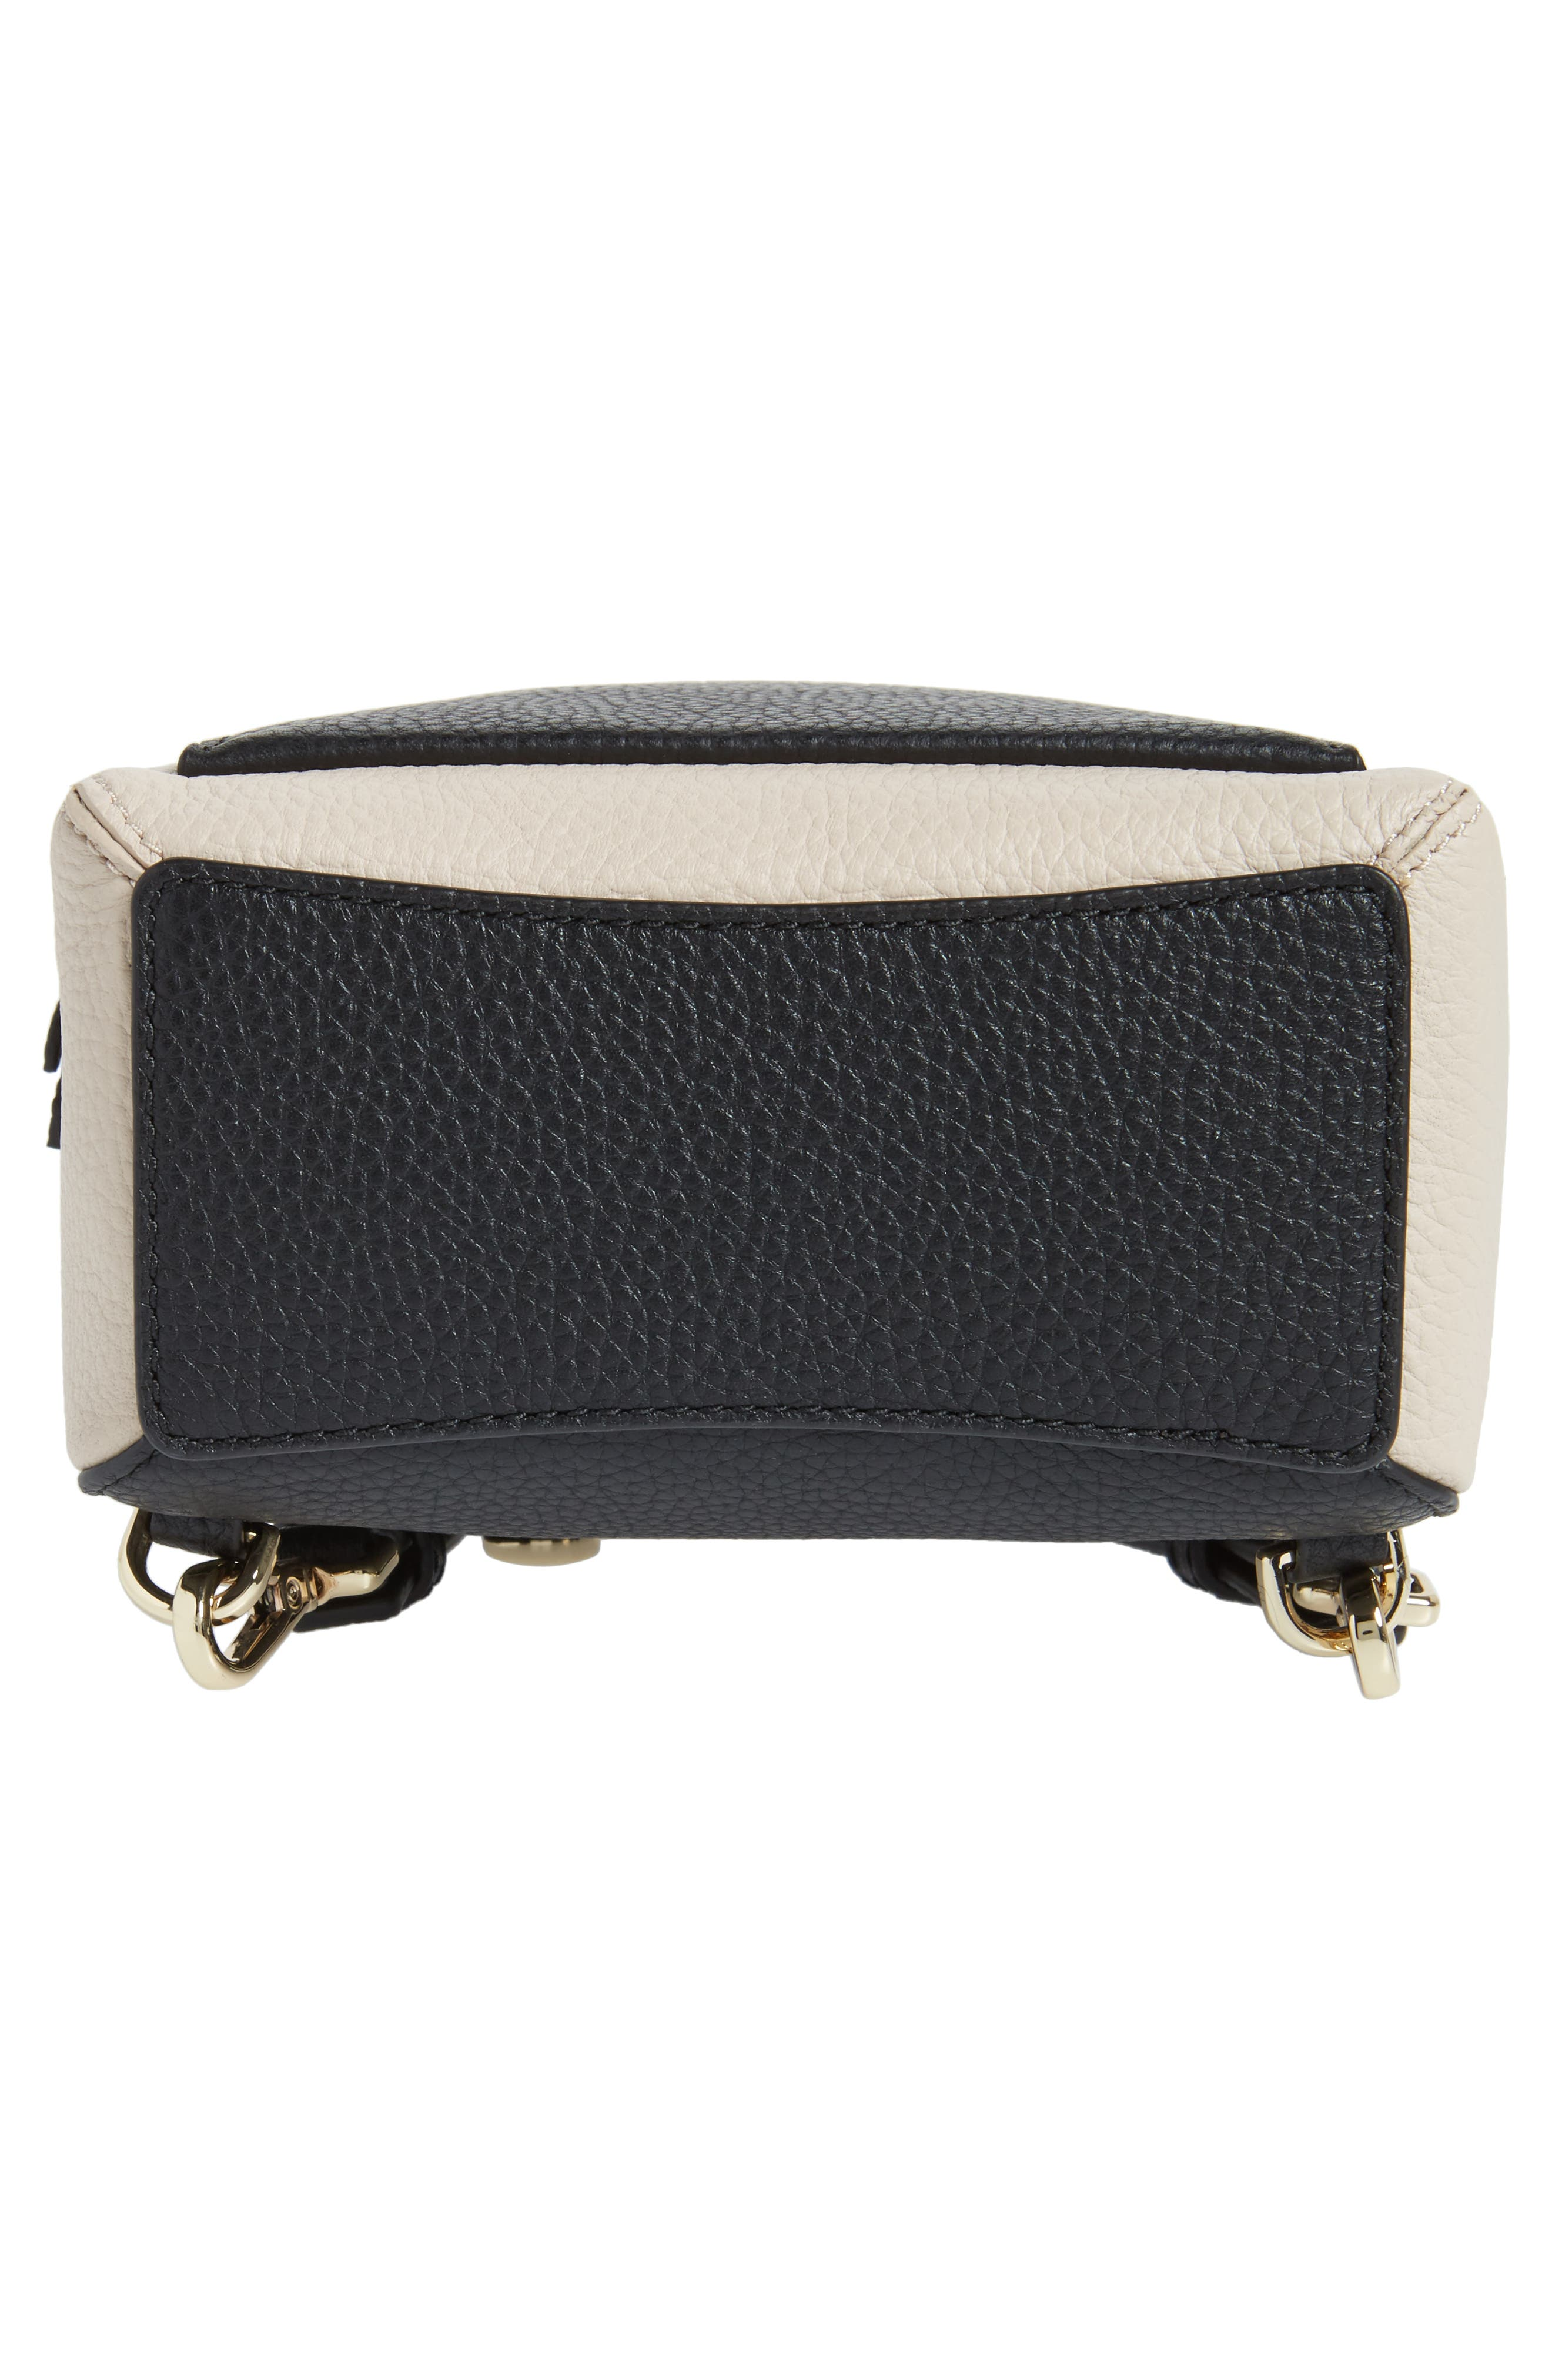 jackson street merry convertible leather backpack,                             Alternate thumbnail 6, color,                             Black/ Soft Porcelain